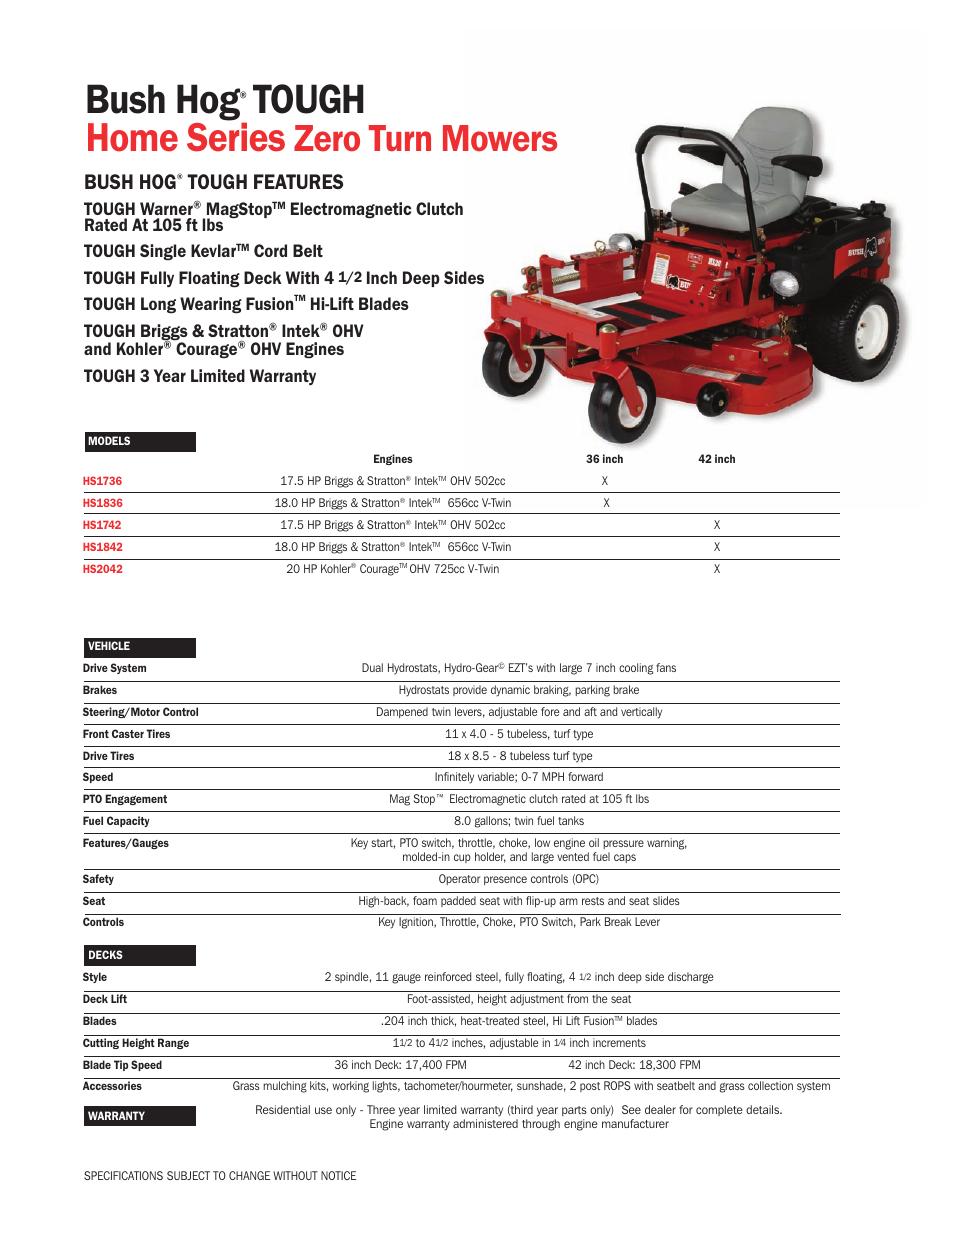 Bush Hog Home Series User Manual